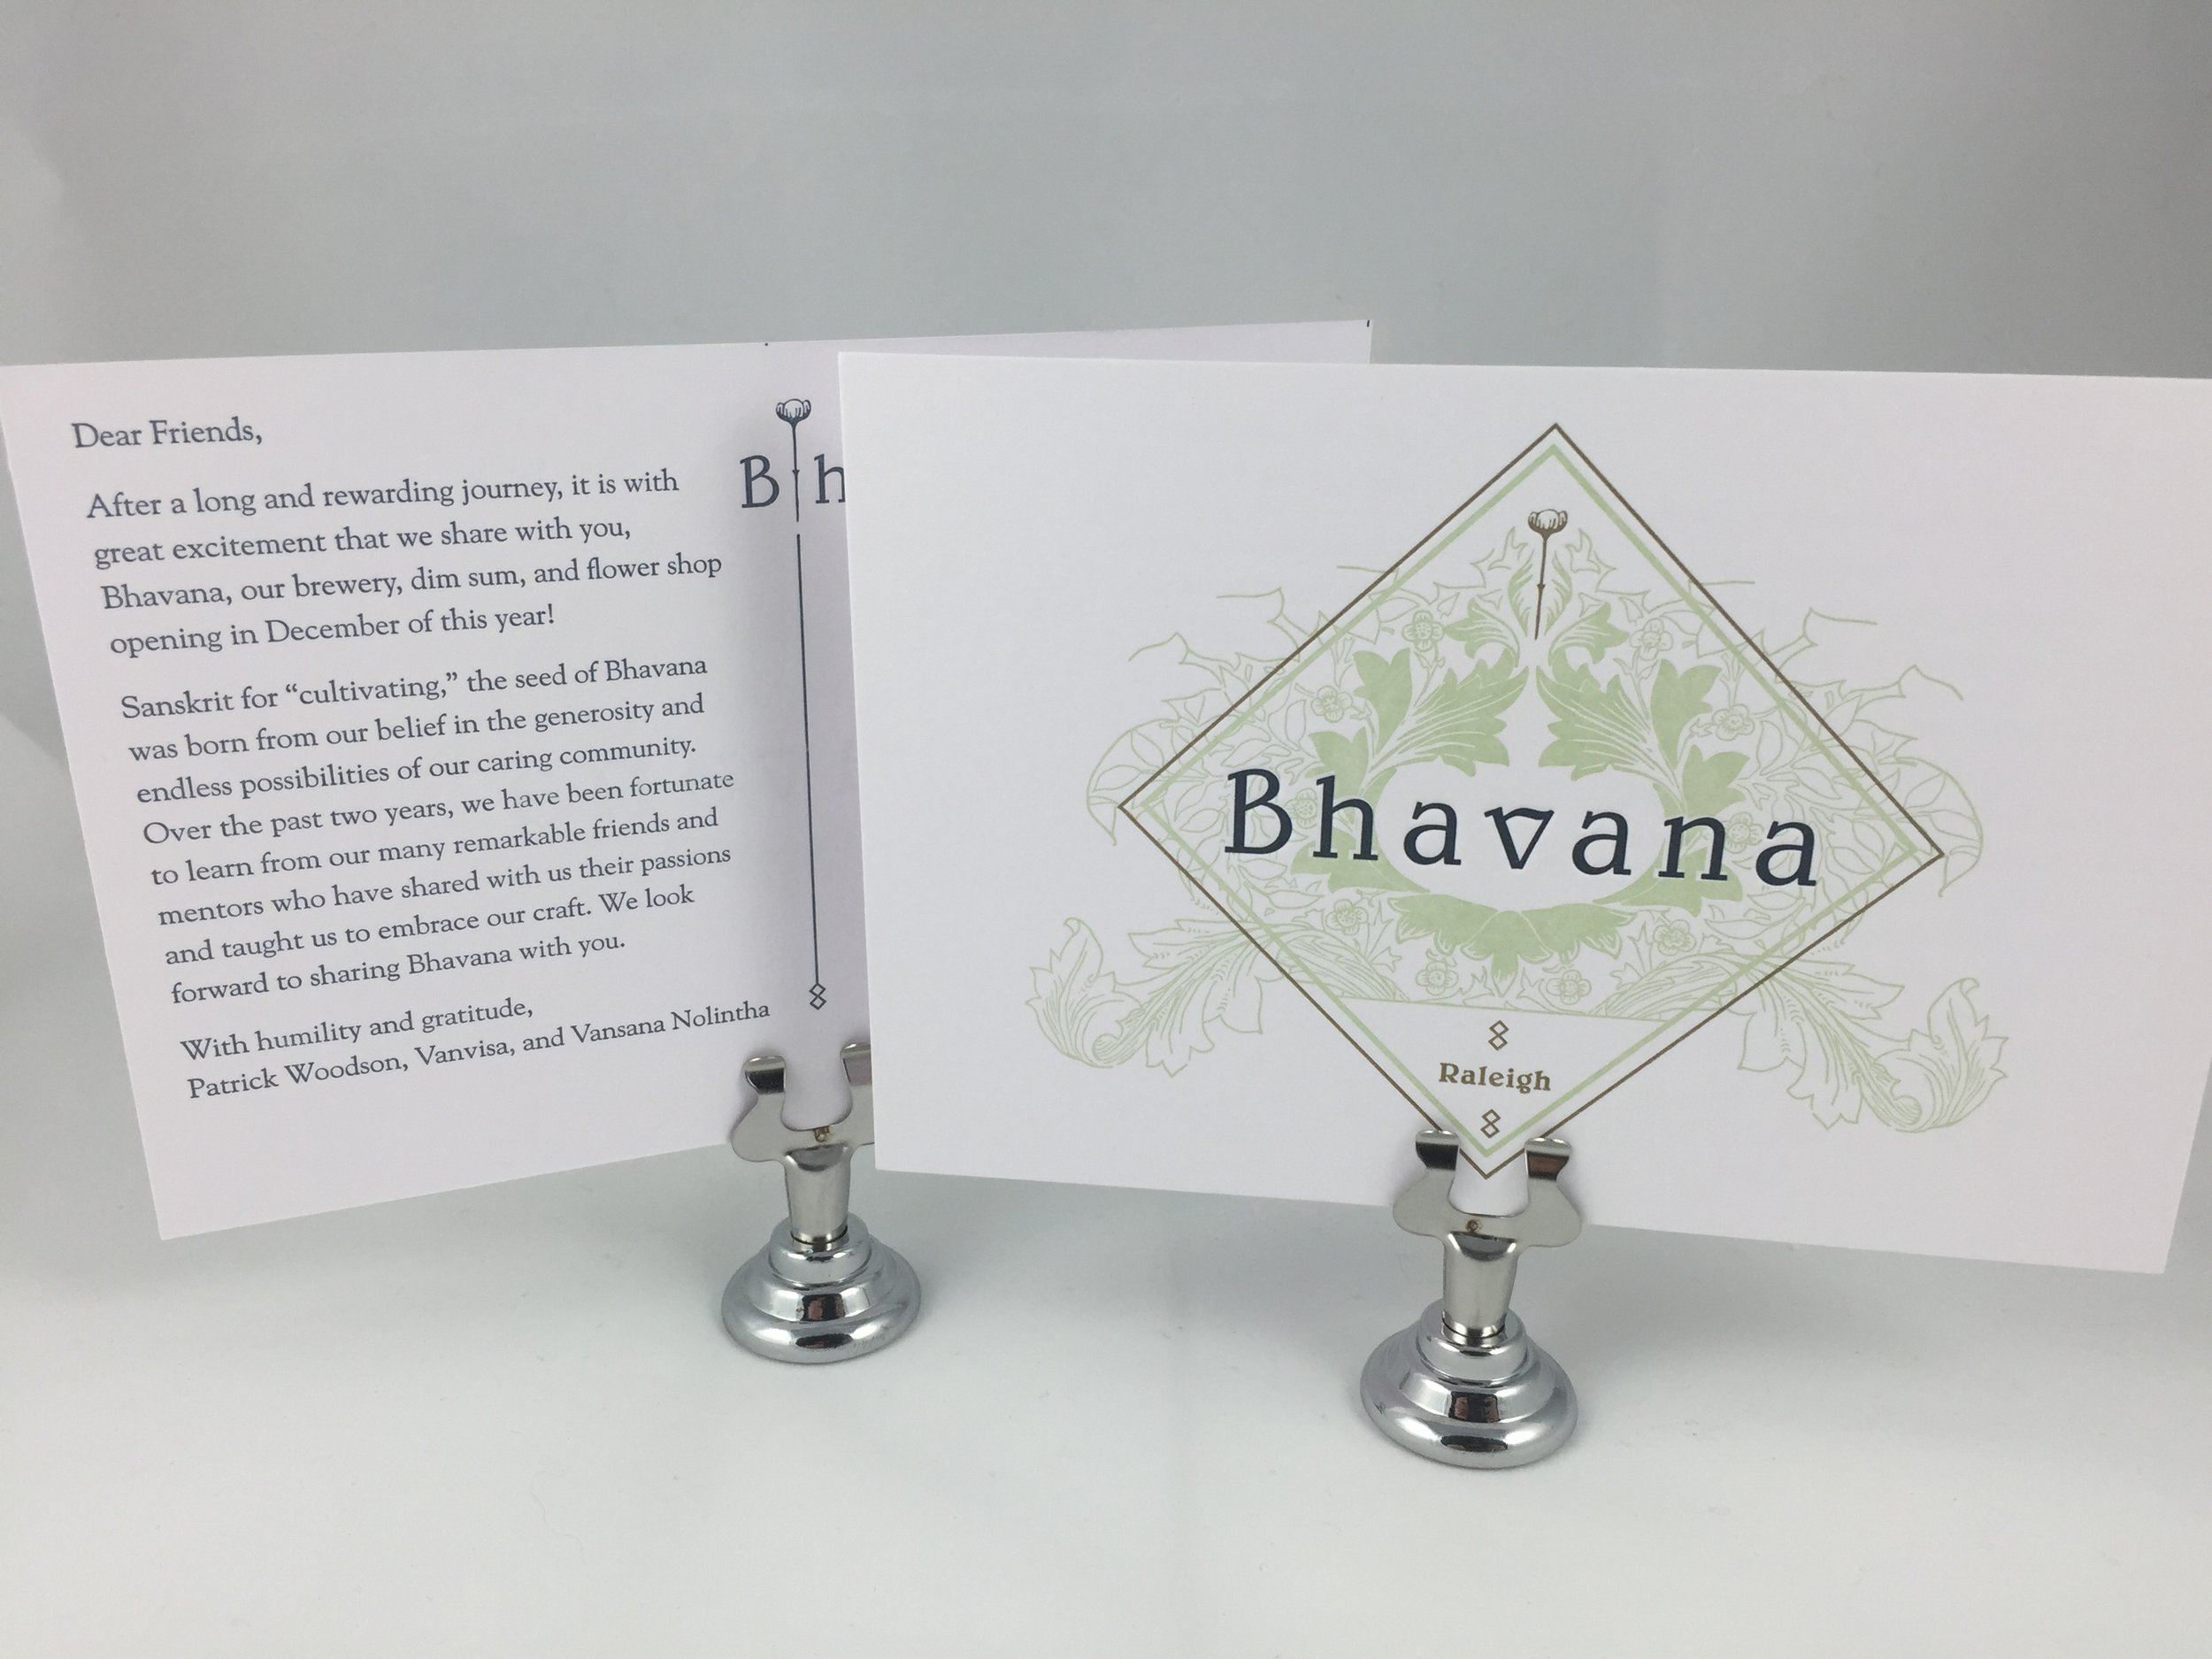 Bhavana letterpress postcard